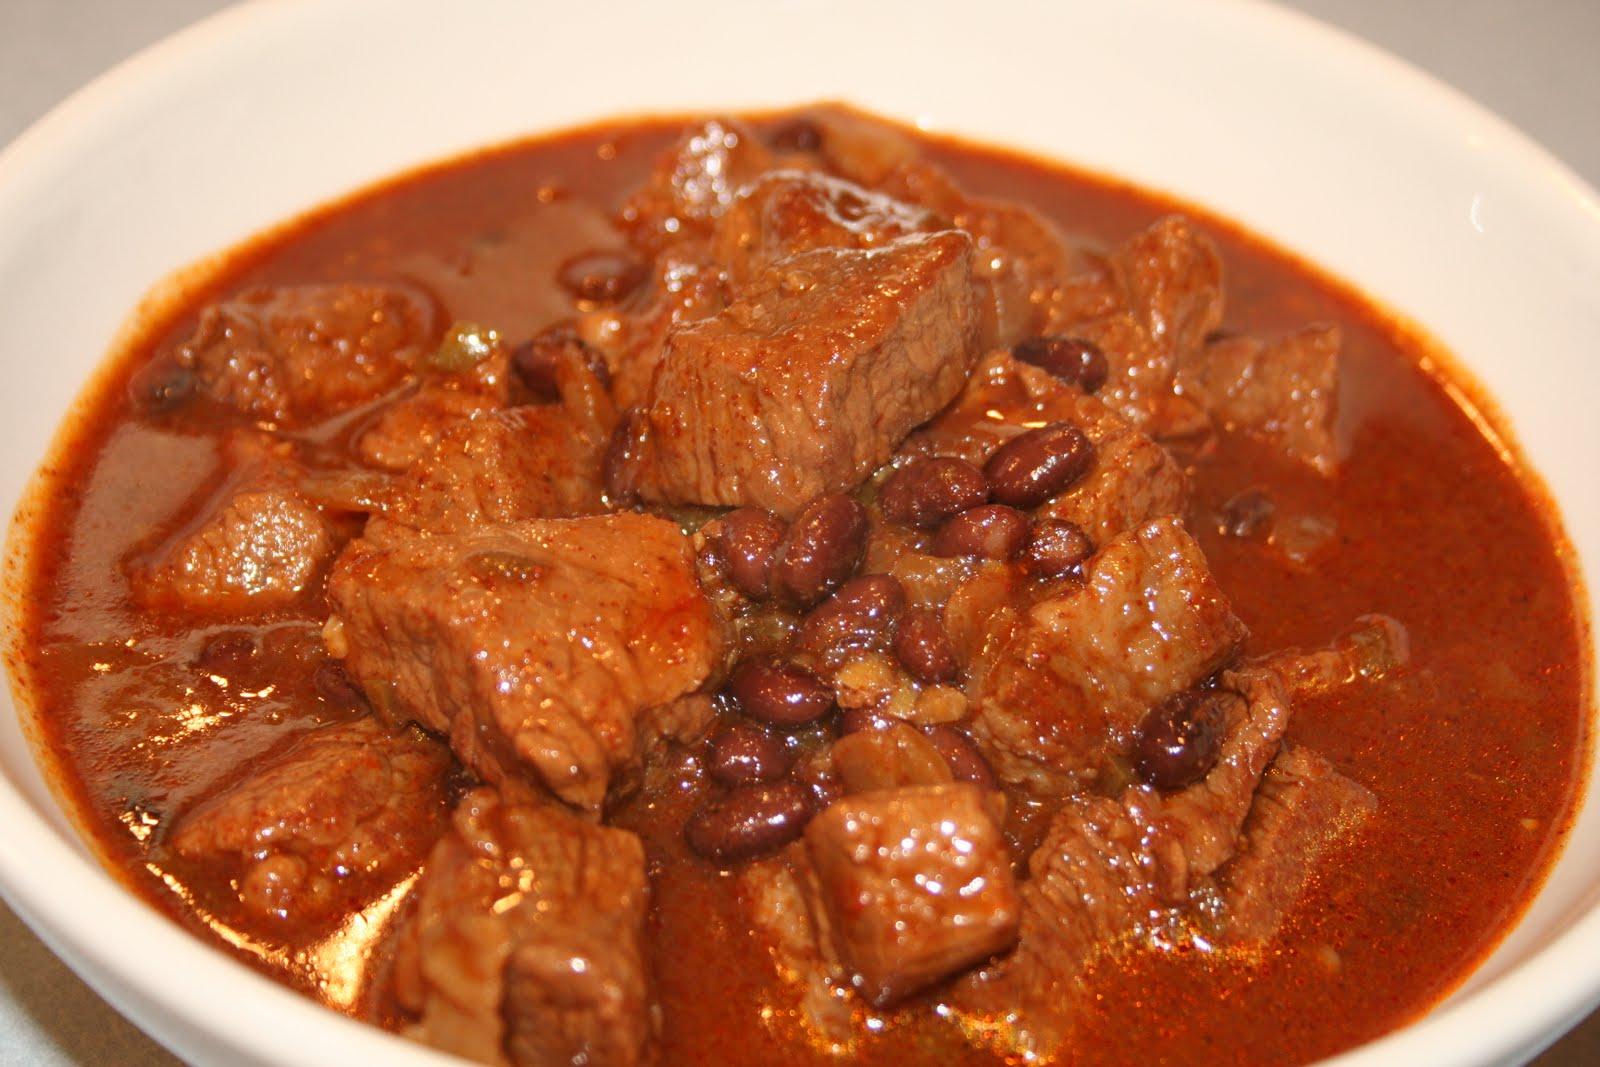 ... chili recipe i ve used steak in chili crockpot chili made with steak